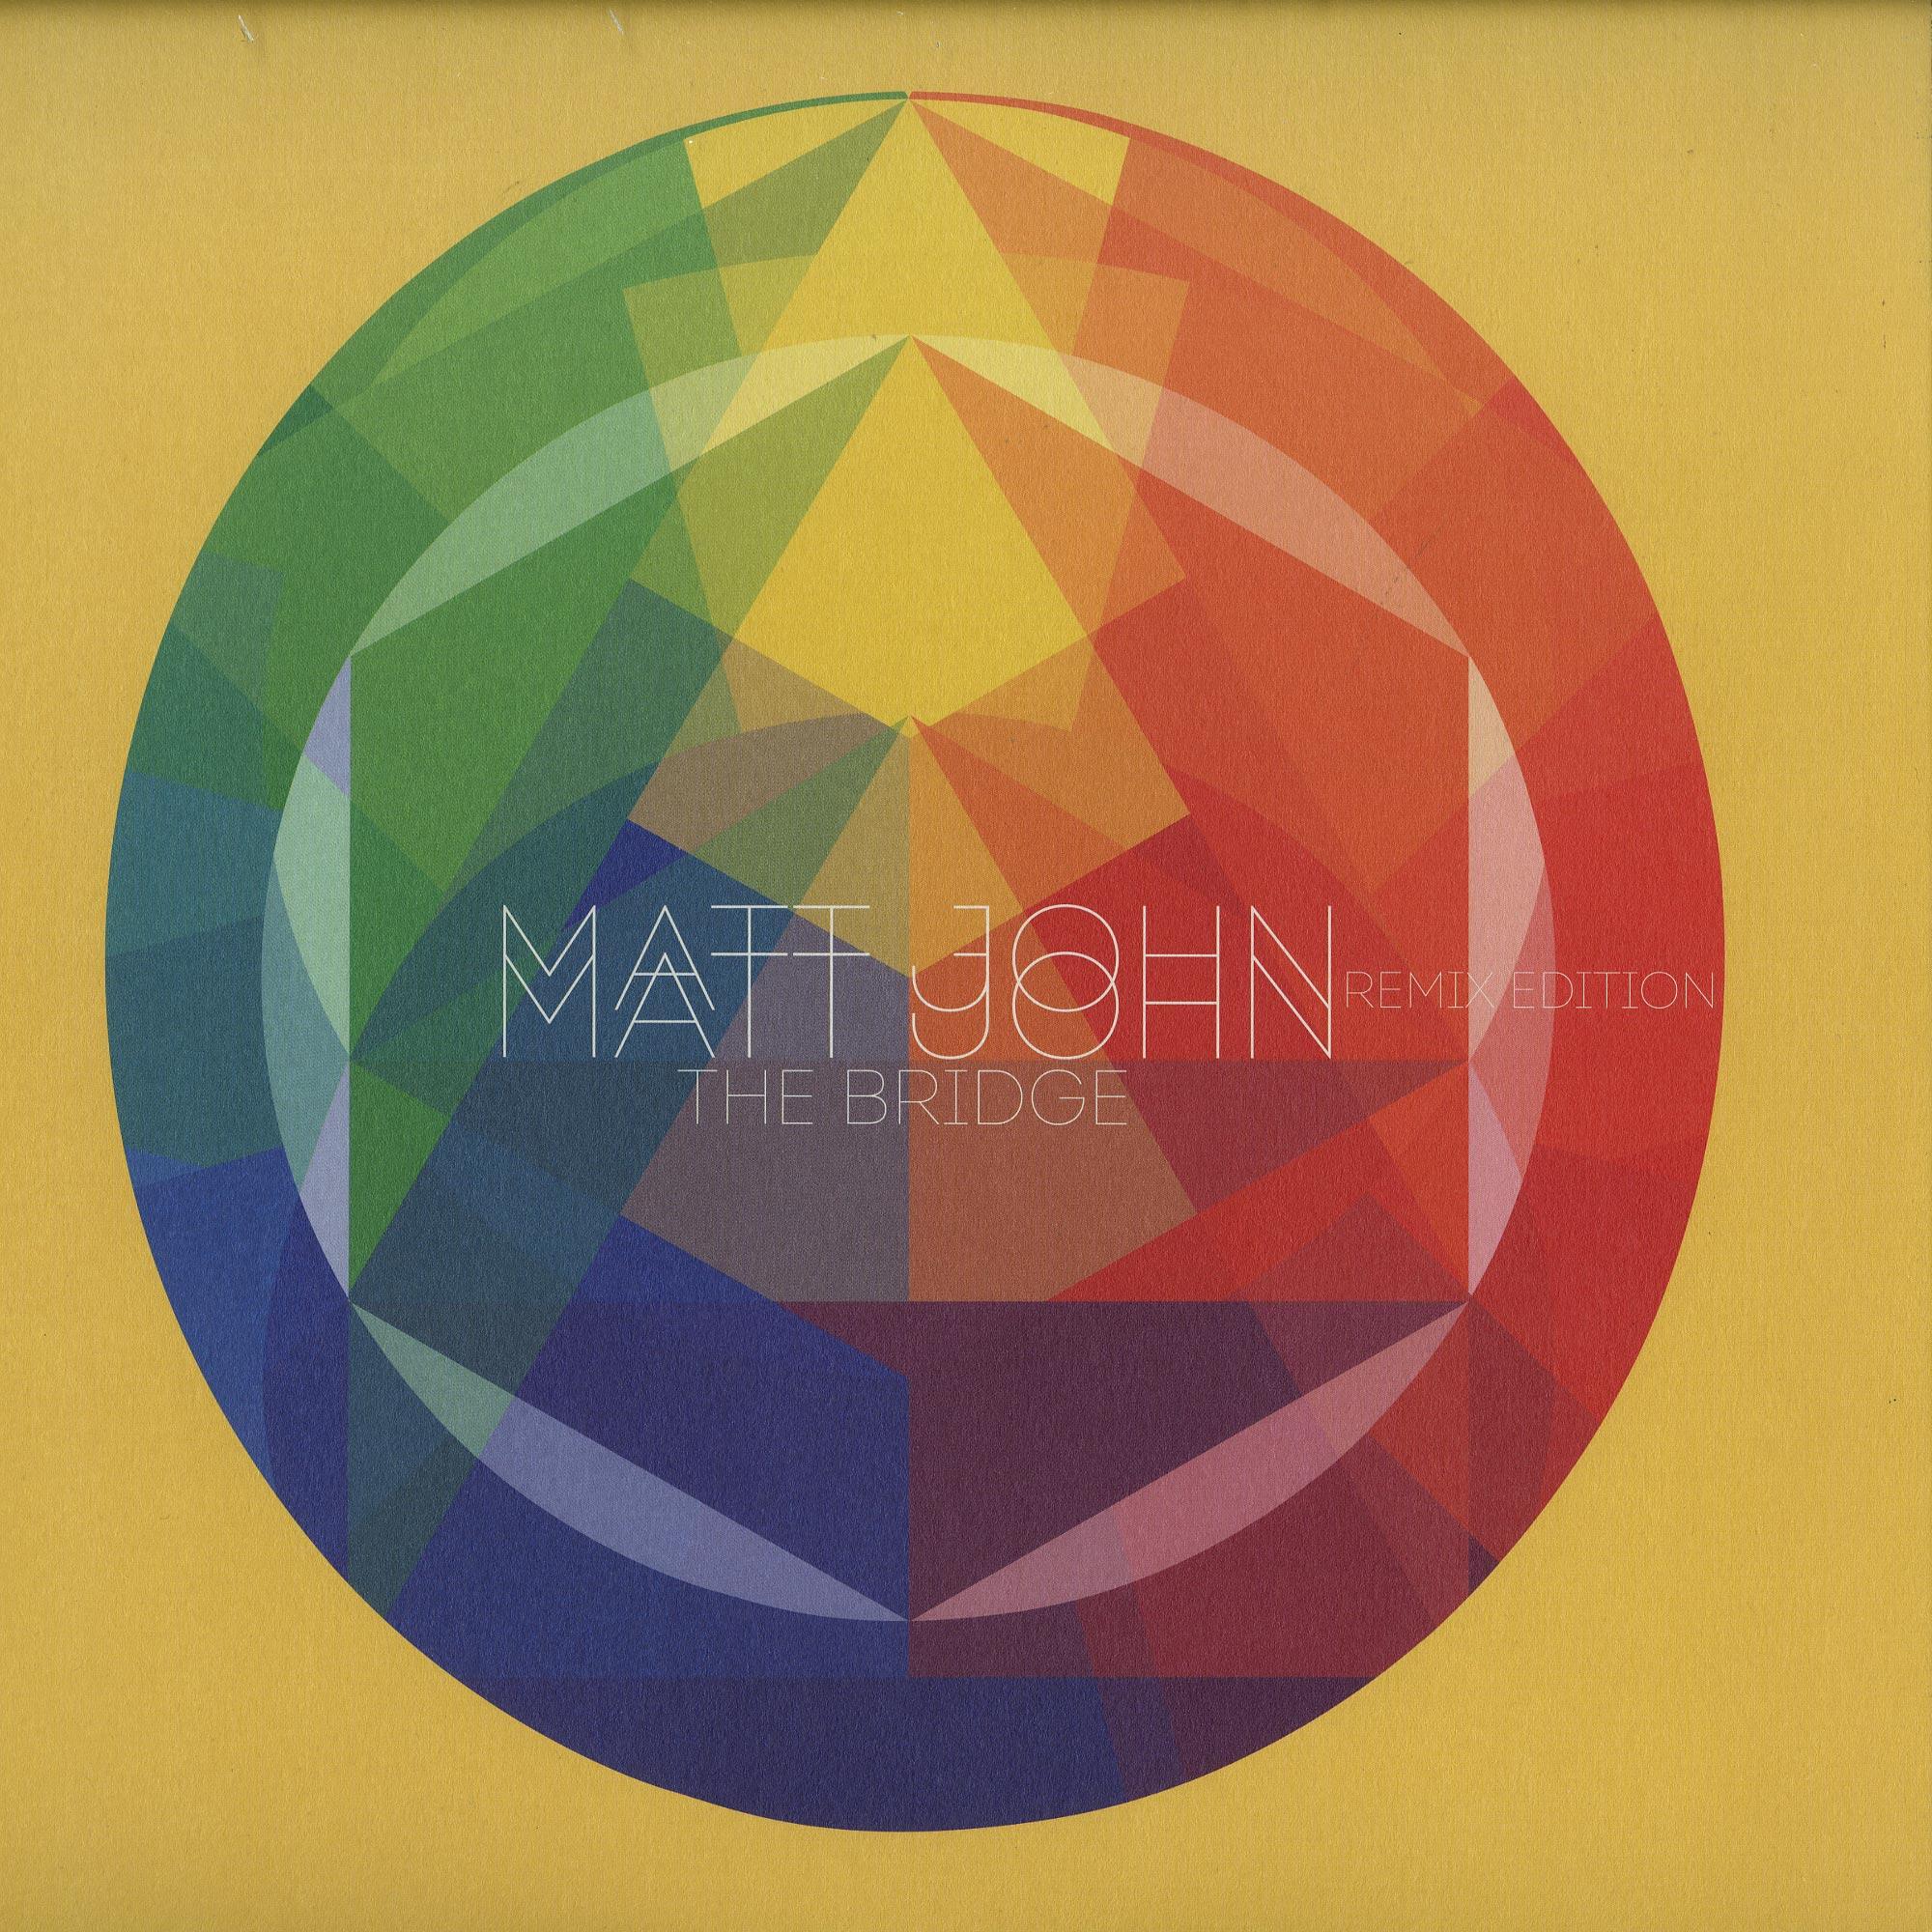 Matt John - THE BRIDGE REMIXES